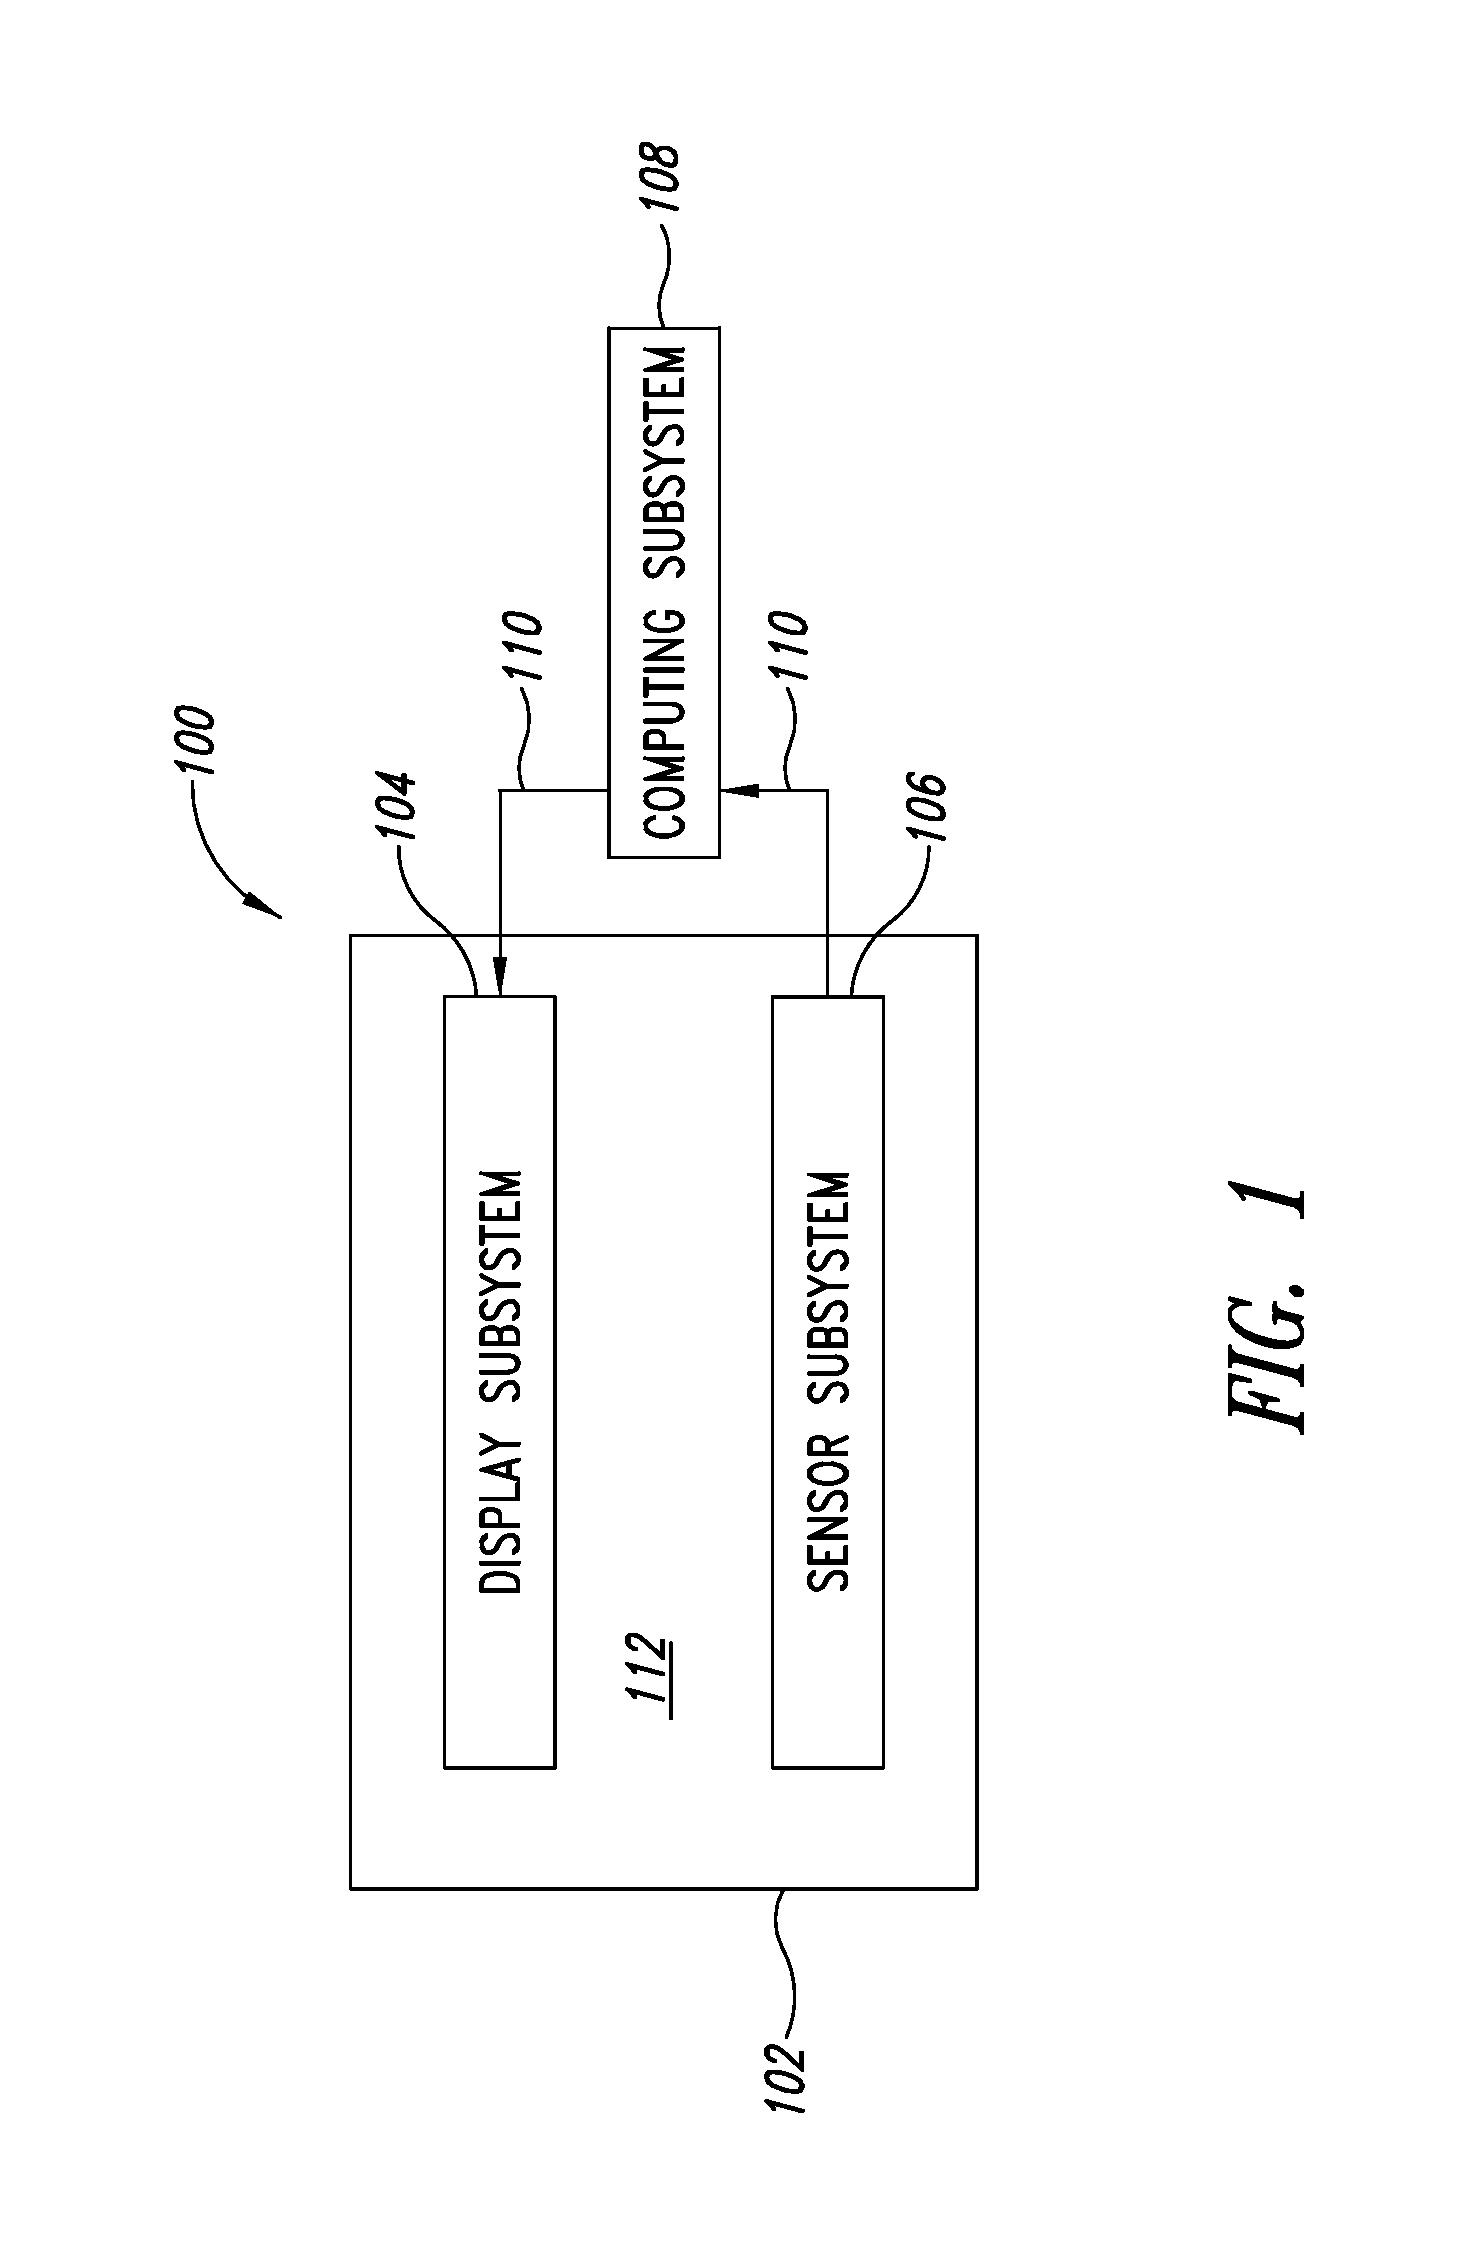 Patent Us 9613487 B2 25 Floppy Drive Wind Generator Construction Details Images